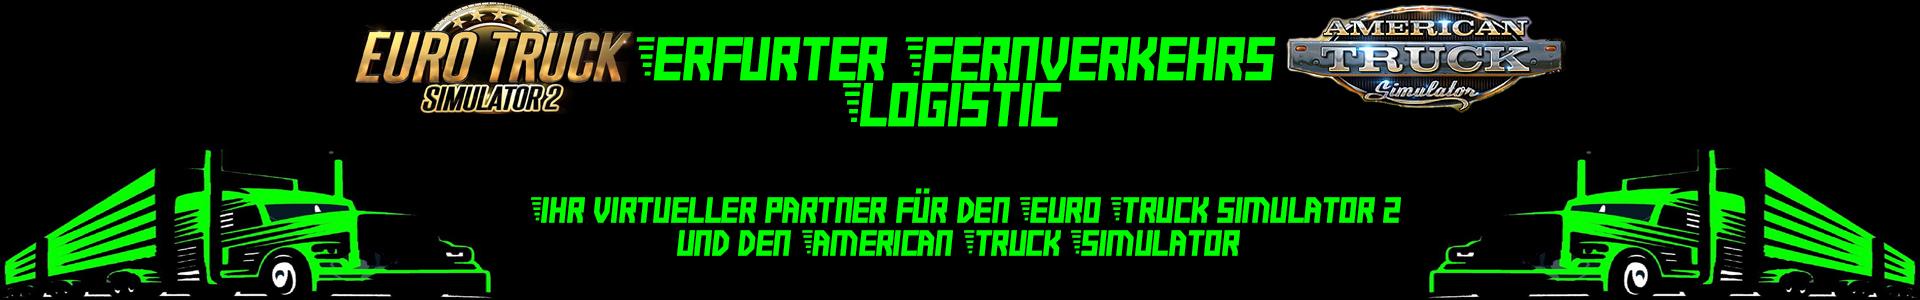 Erfurter Fernverkehrs Logistic